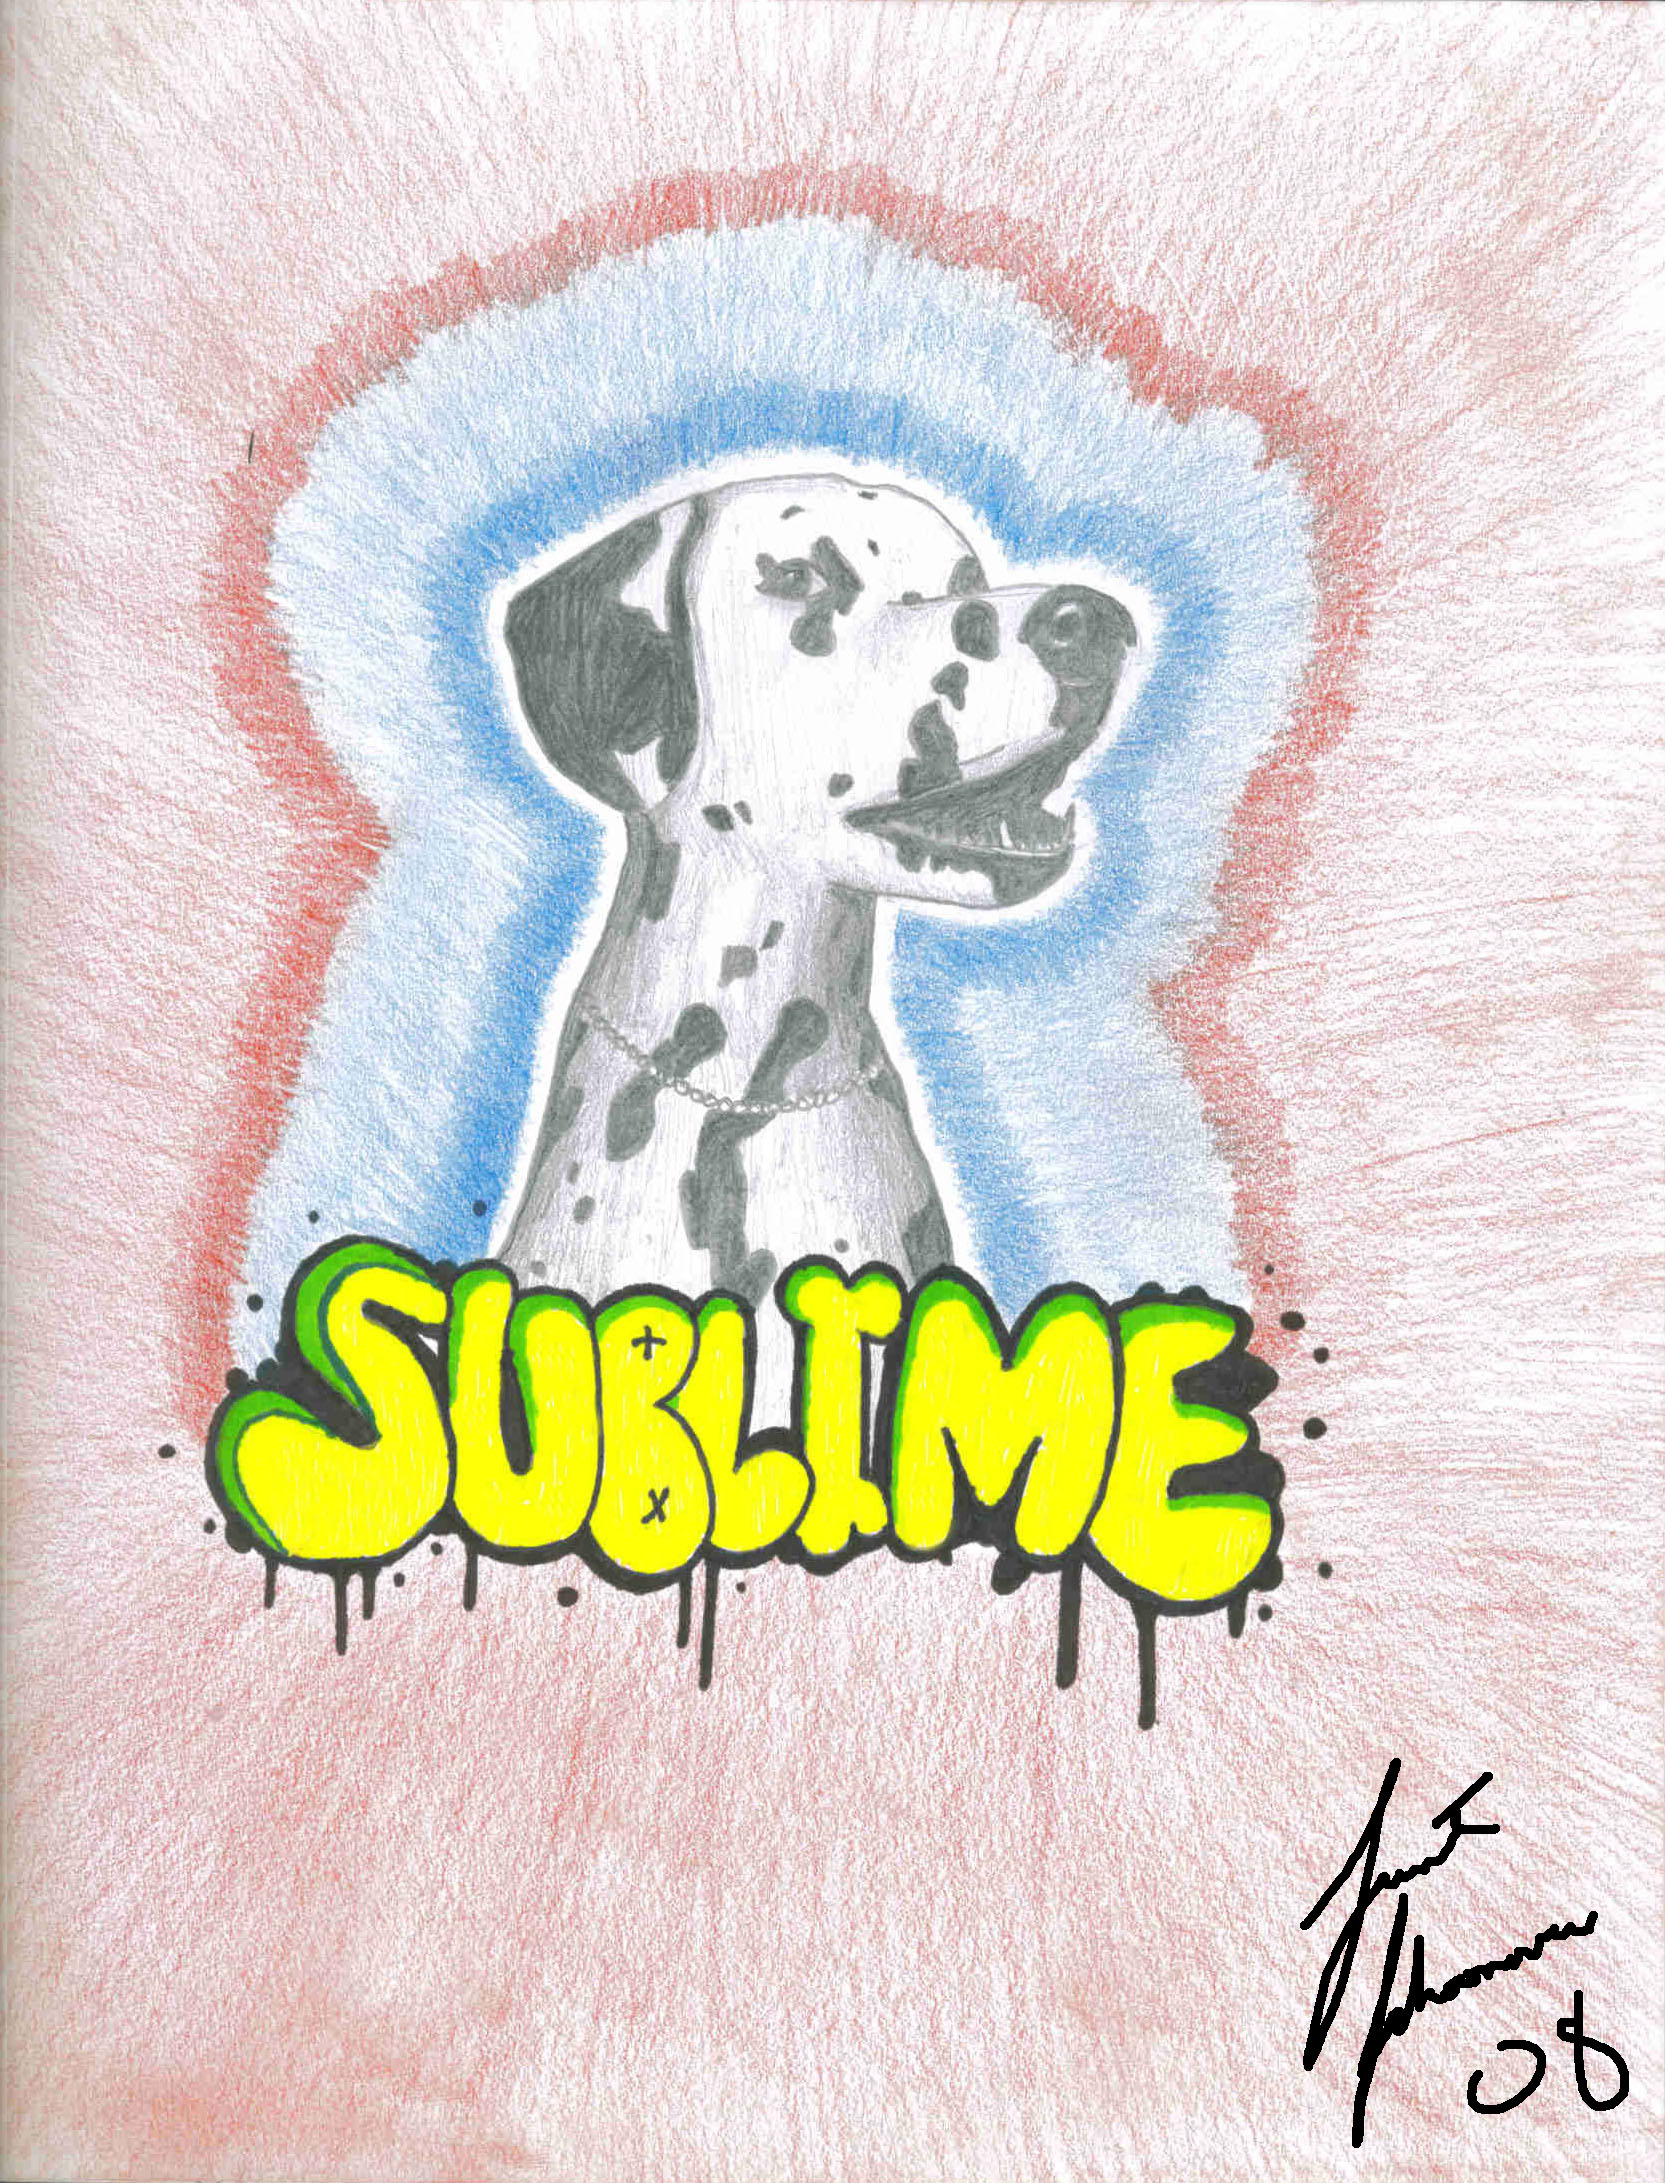 Lou Dog Sublime